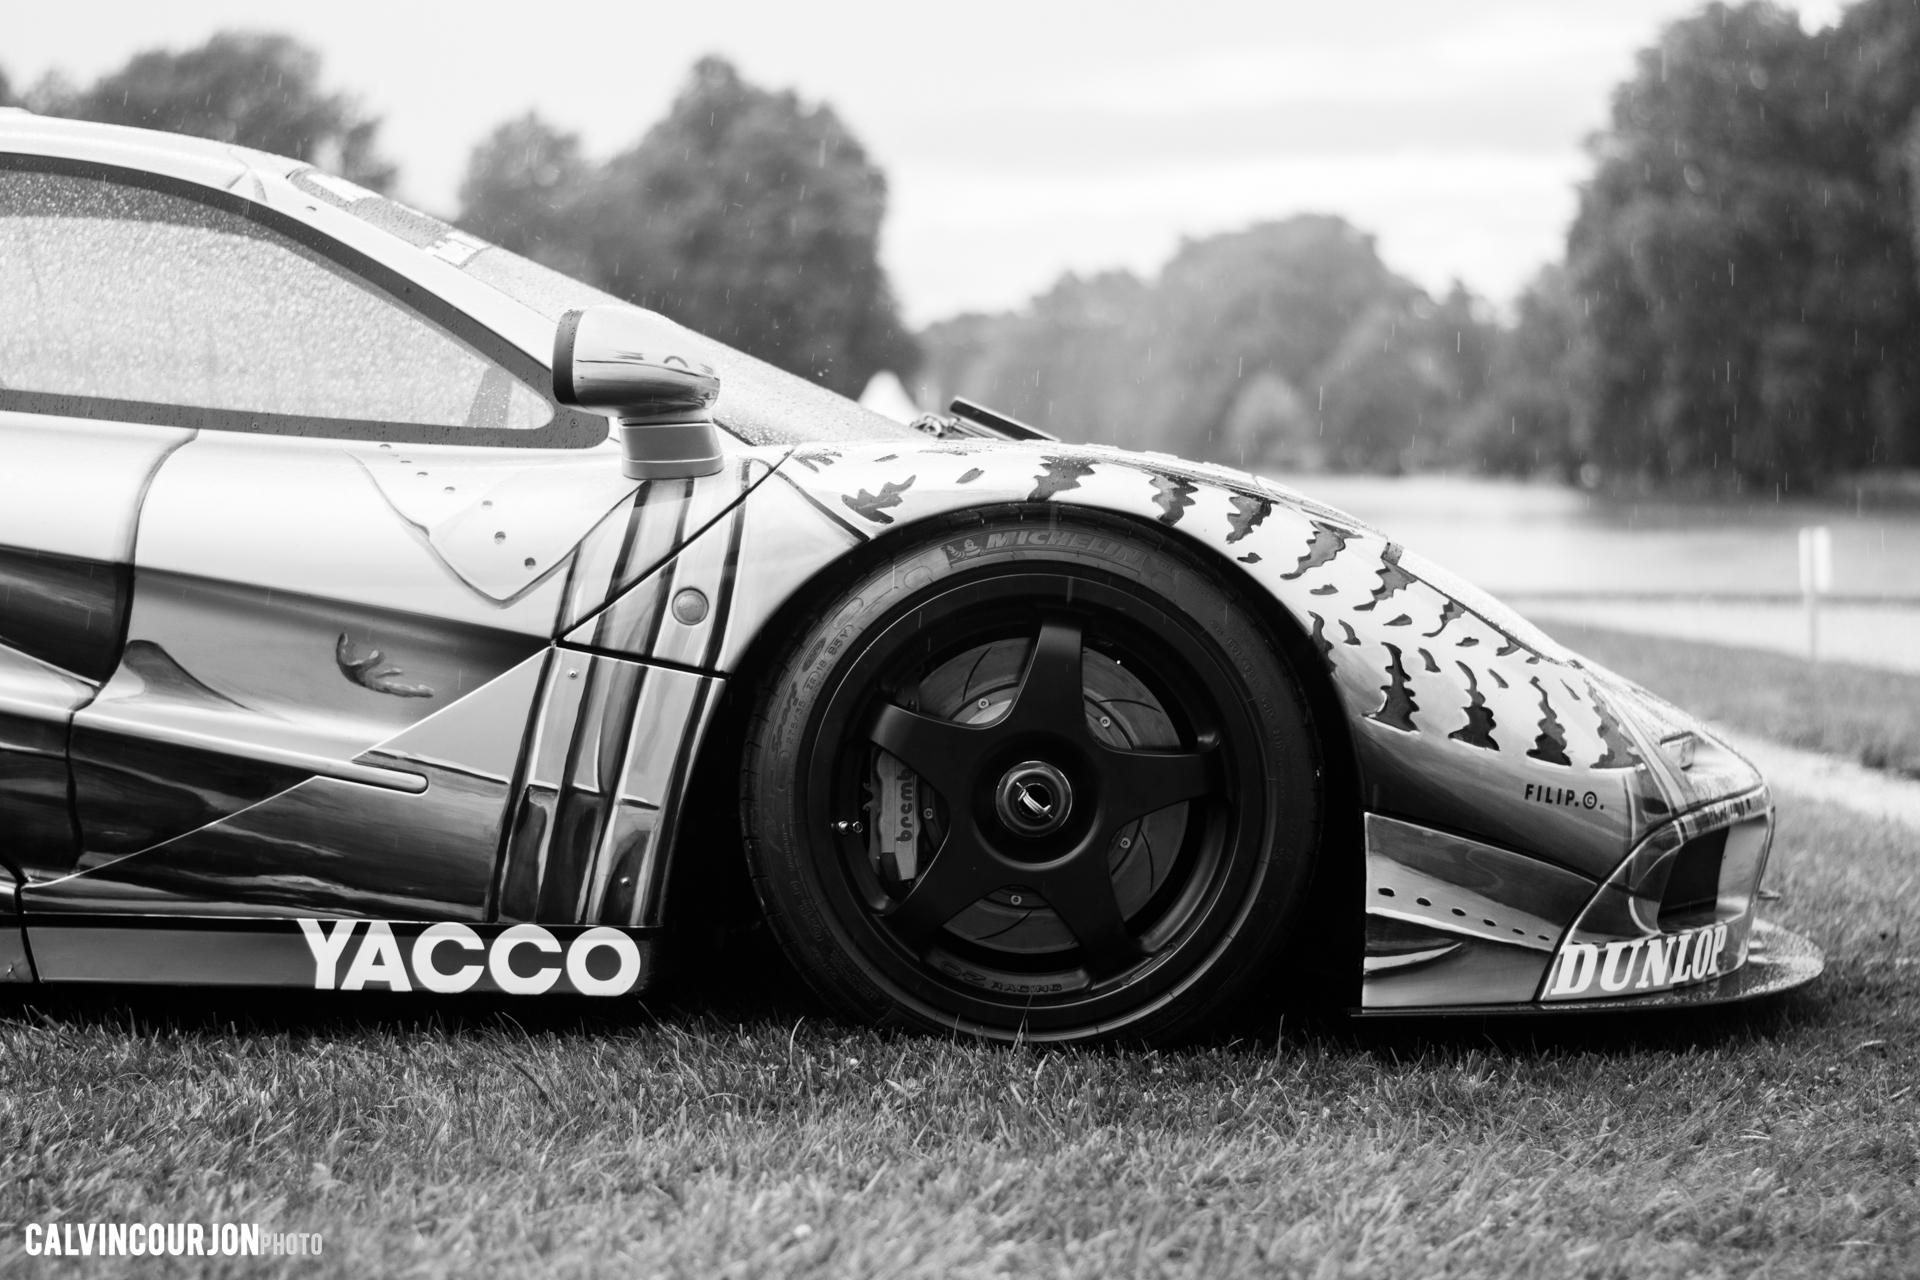 McLaren F1 (1995) – Cesar - front wheel / roue avant McLaren – Chantilly 2015 – photo Calvin Courjon